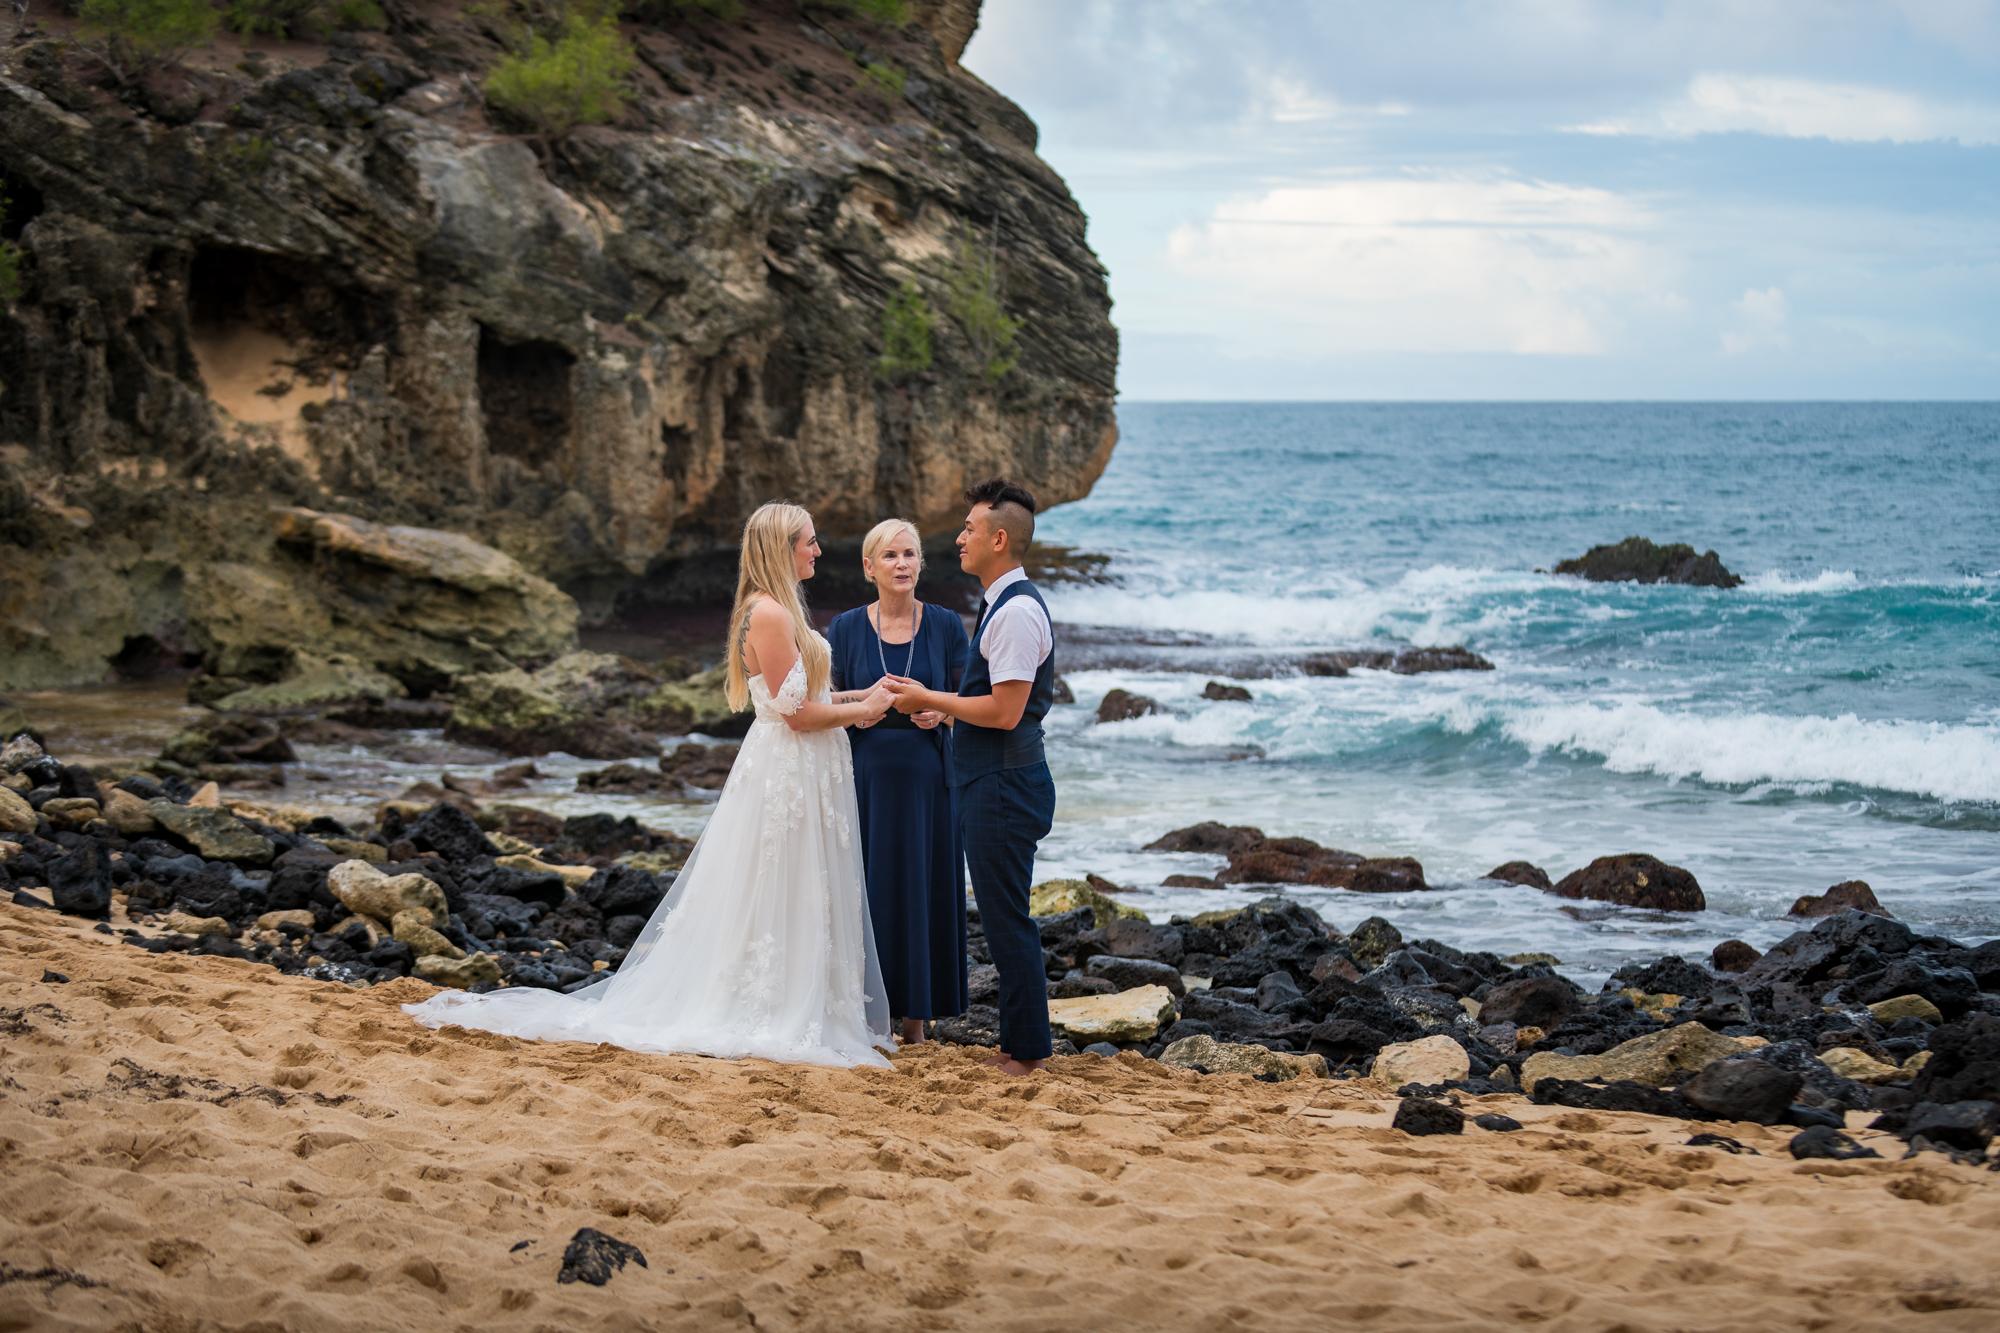 sunrise-wedding-coleen-shipwrecks-6-29-2919-9708.jpg